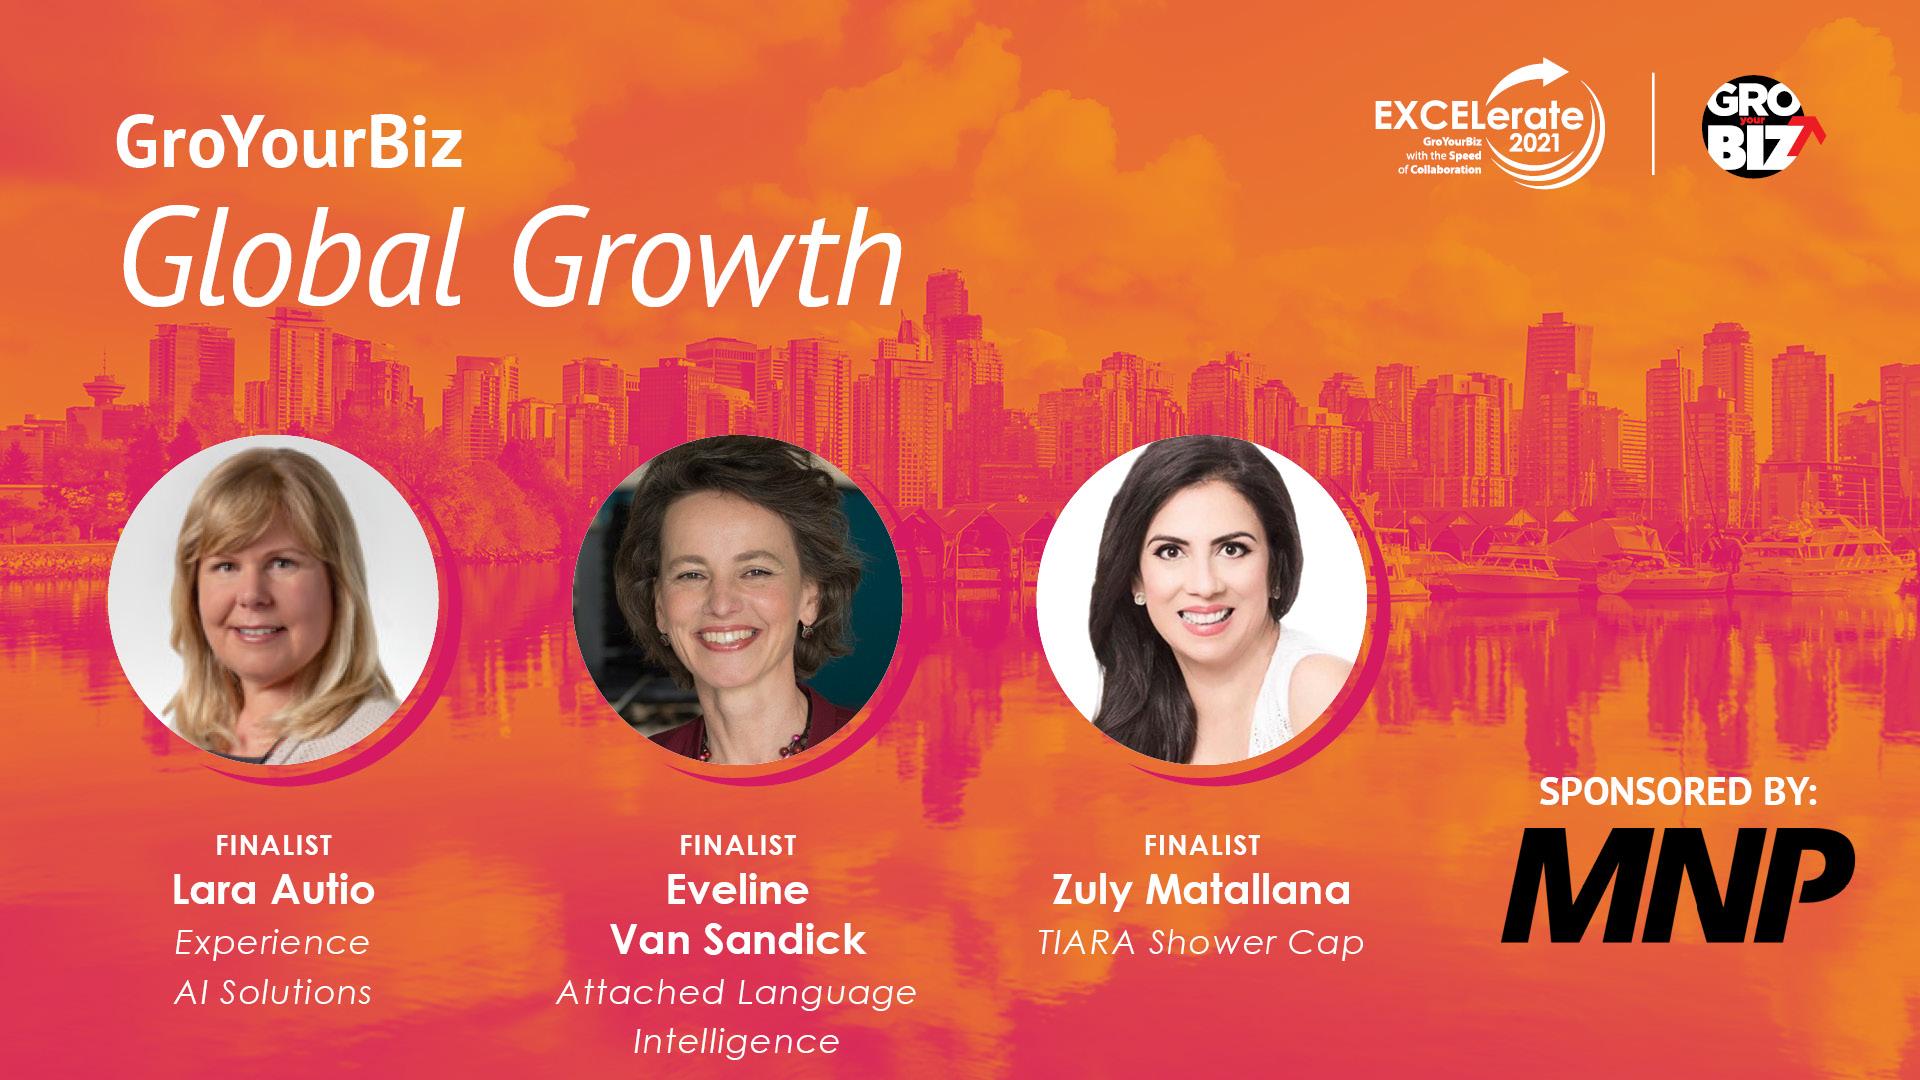 GroYourBiz Global Growth Award Finalists